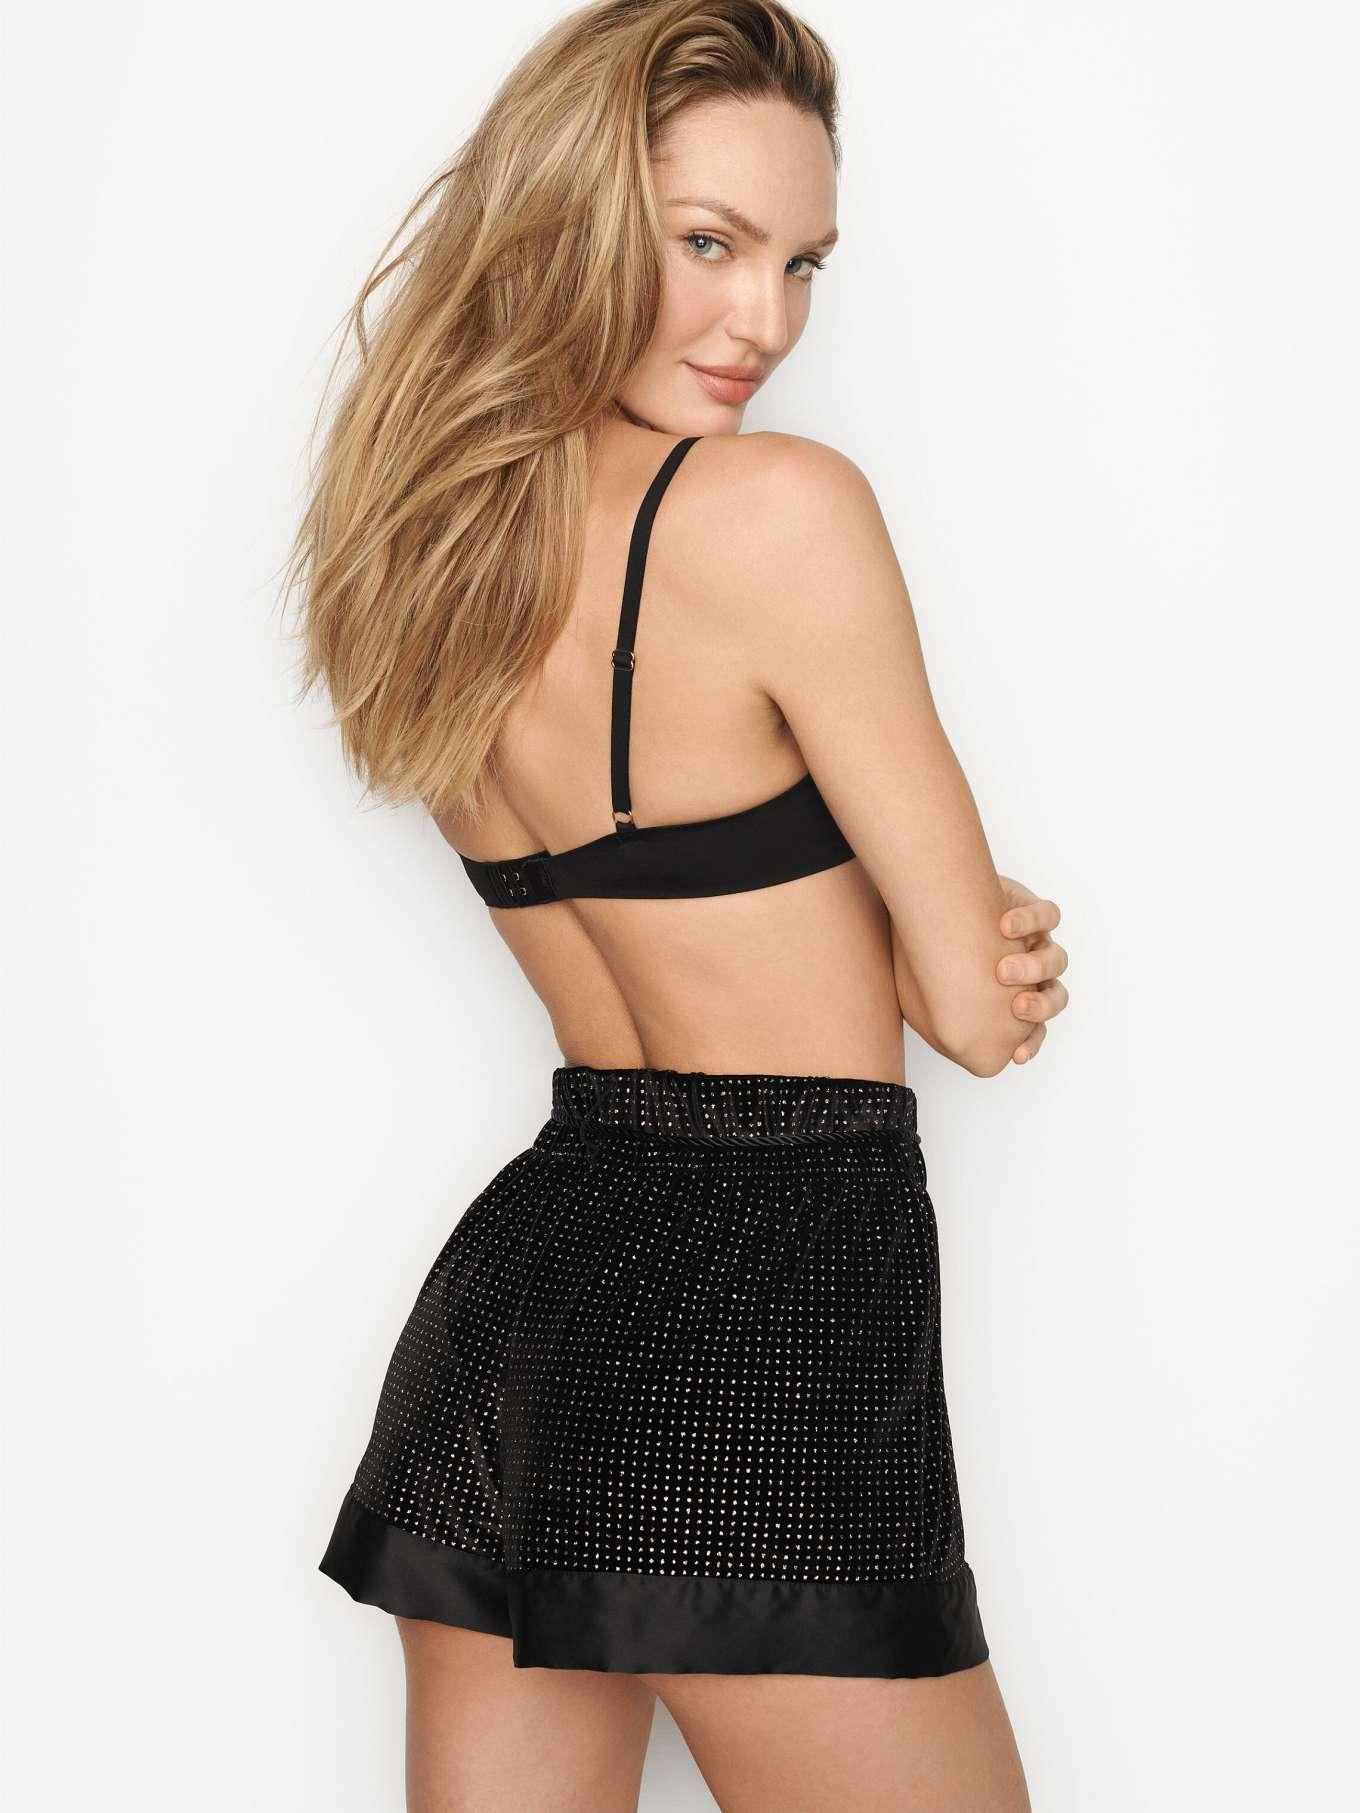 Candice Swanepoel 2019 : Candice Swanepoel – Victorias Secret (December 2019)-09